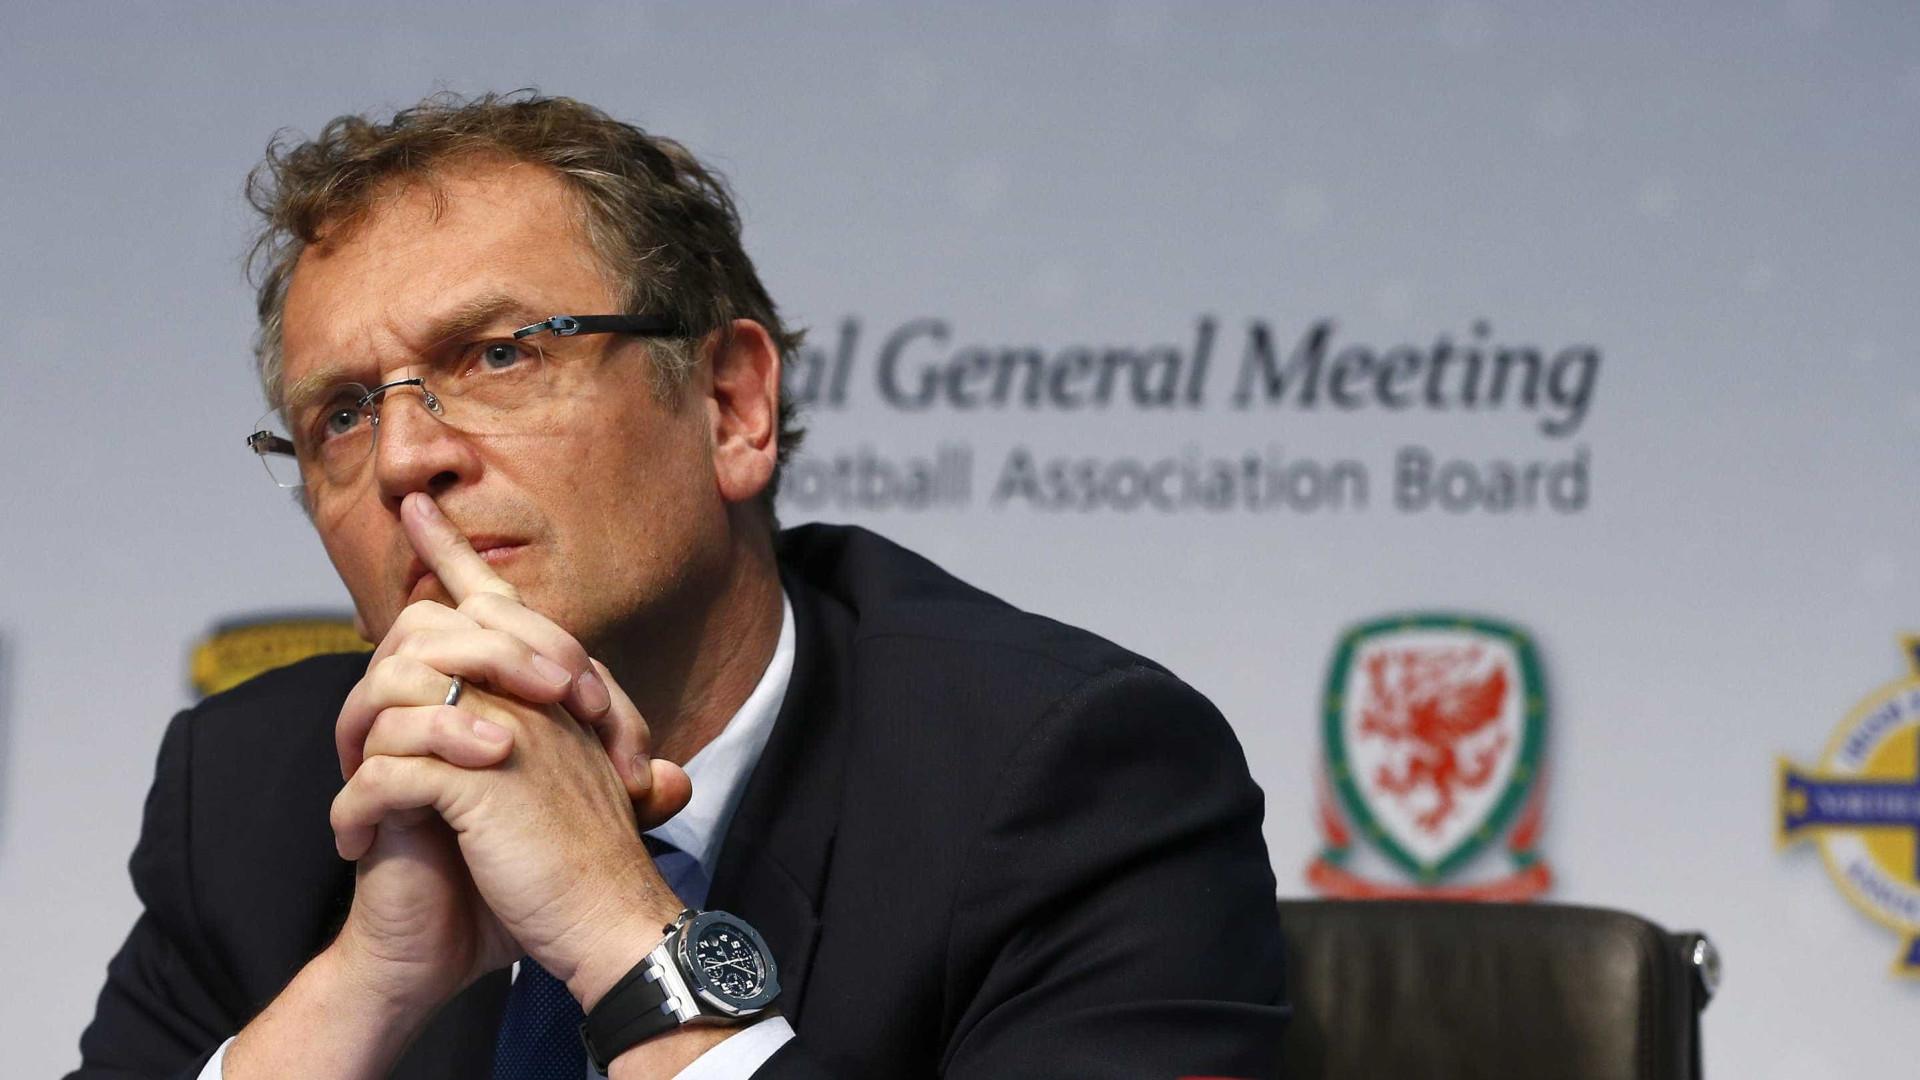 Jérôme Valcke nega ter recebido subornos do presidente do PSG